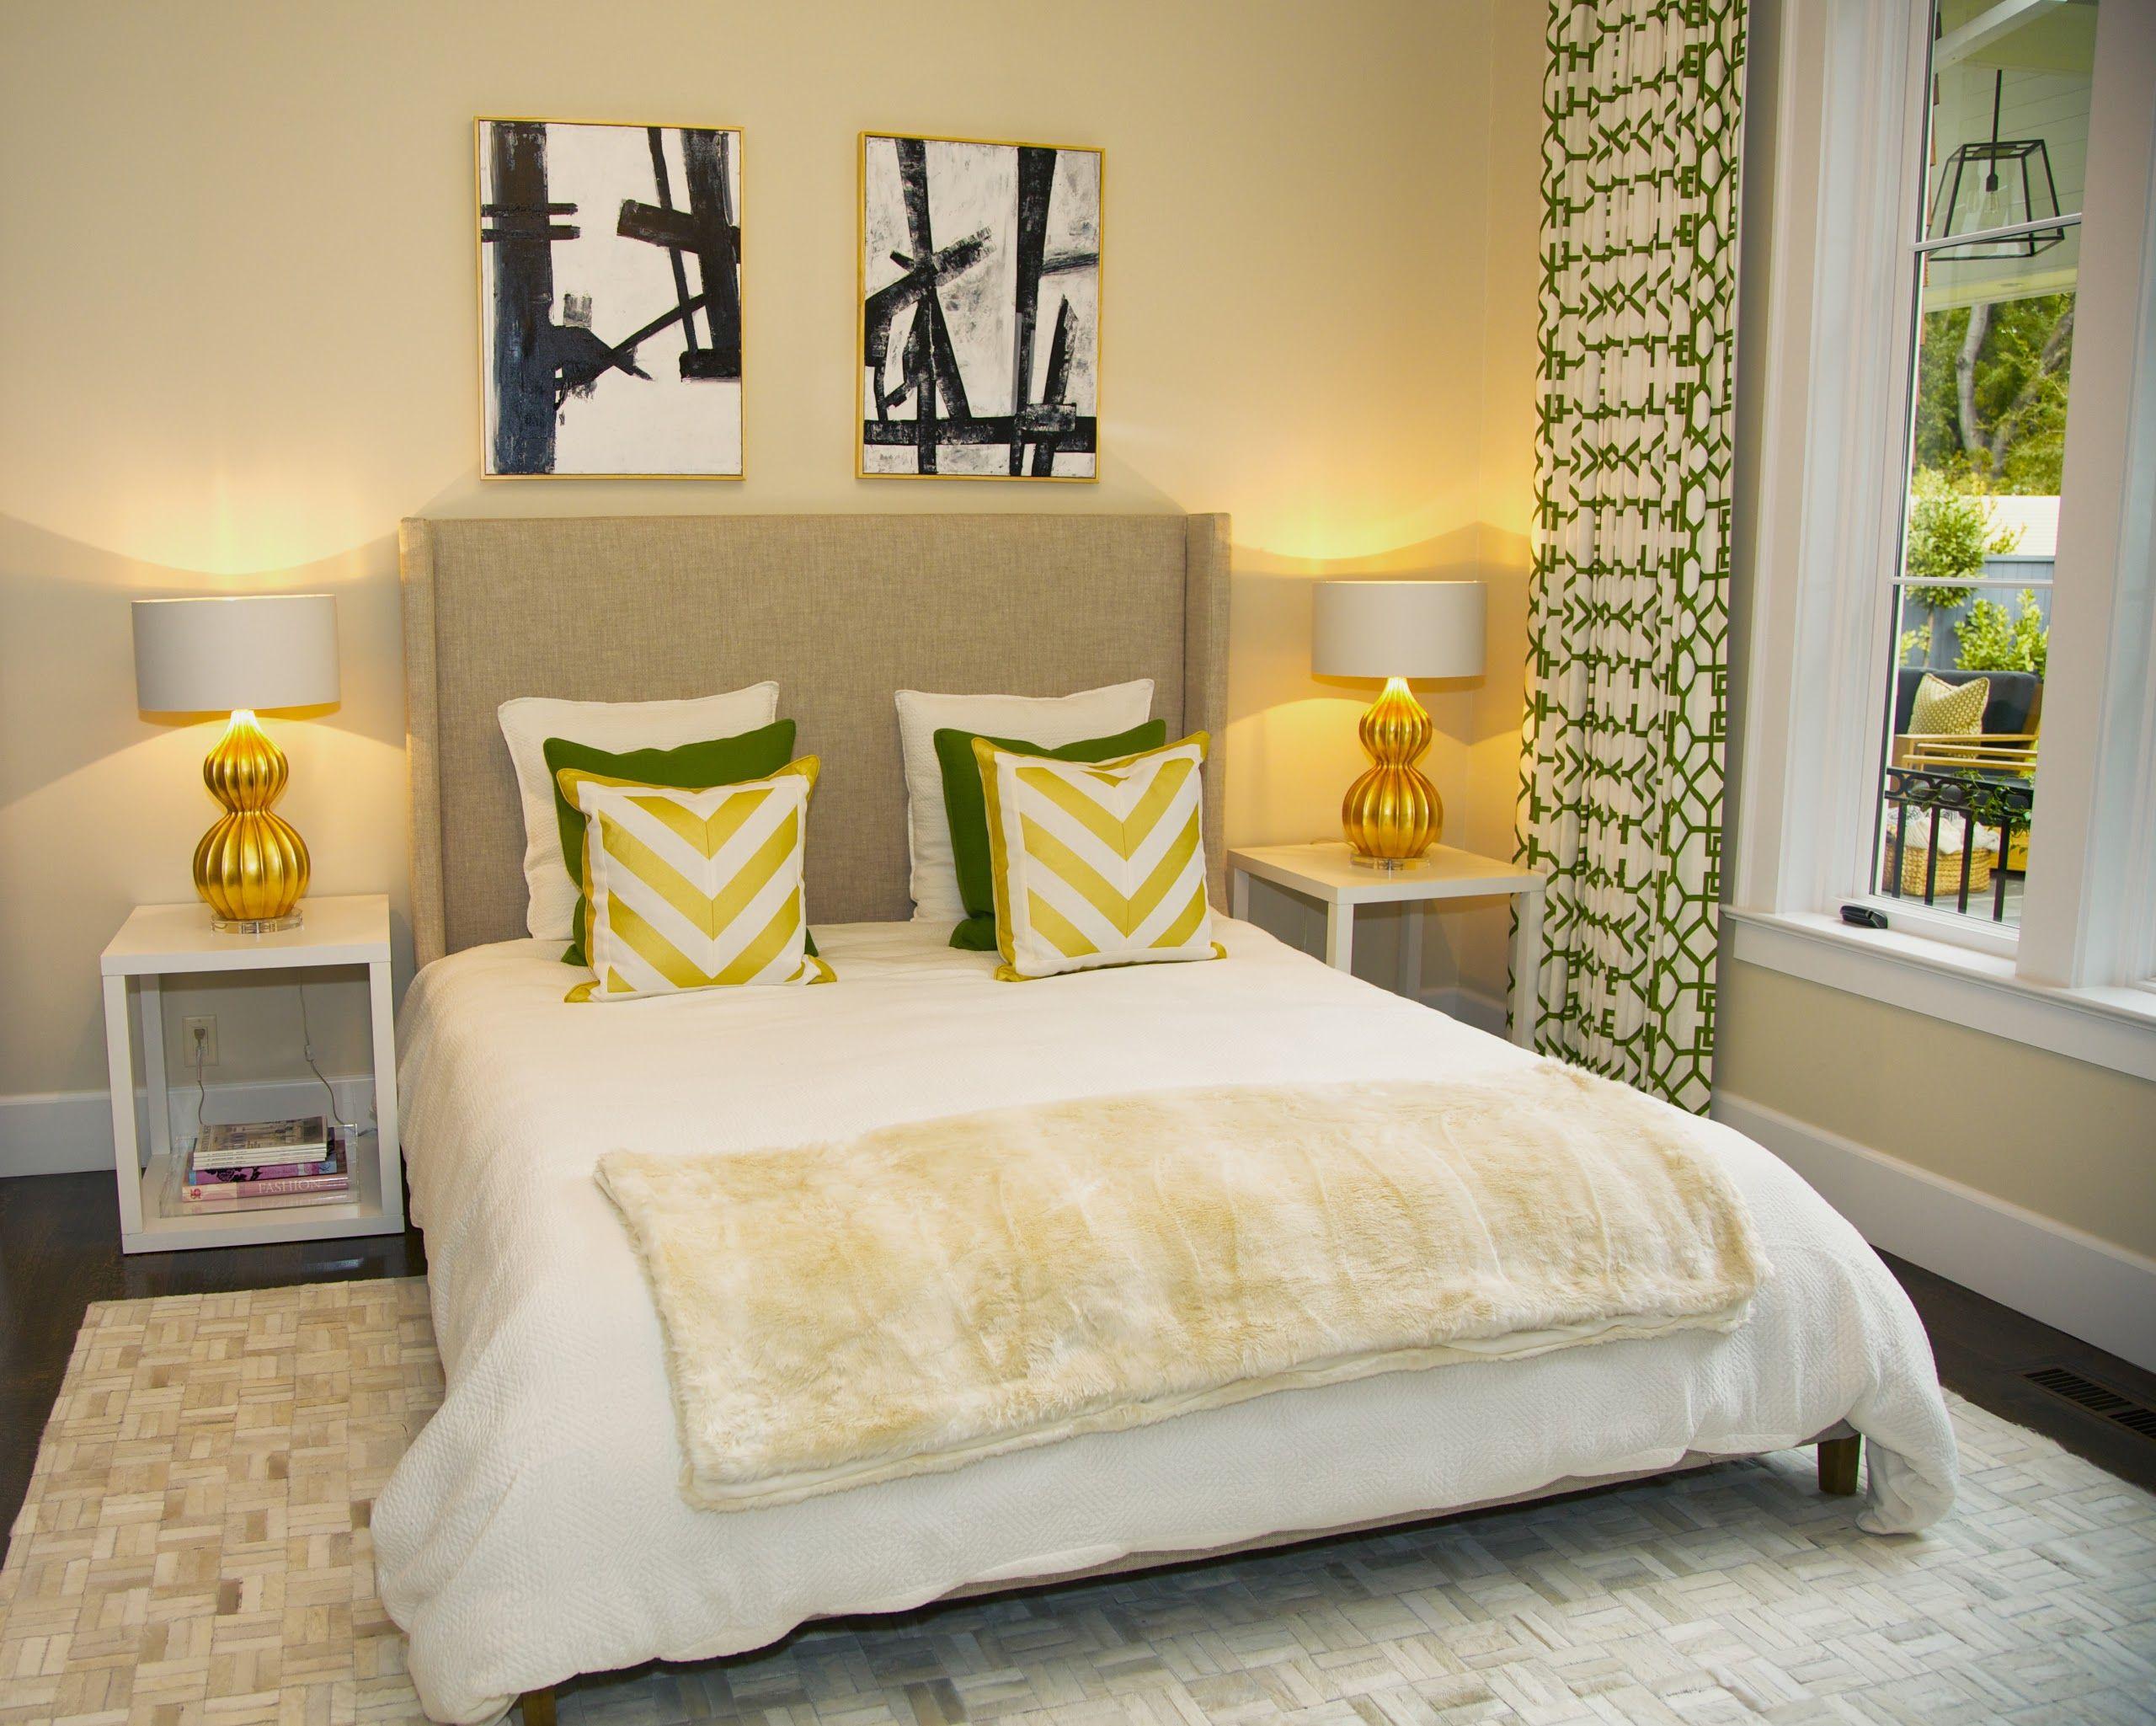 evars anderson interior design master bedroom photo by melodie rh pinterest com